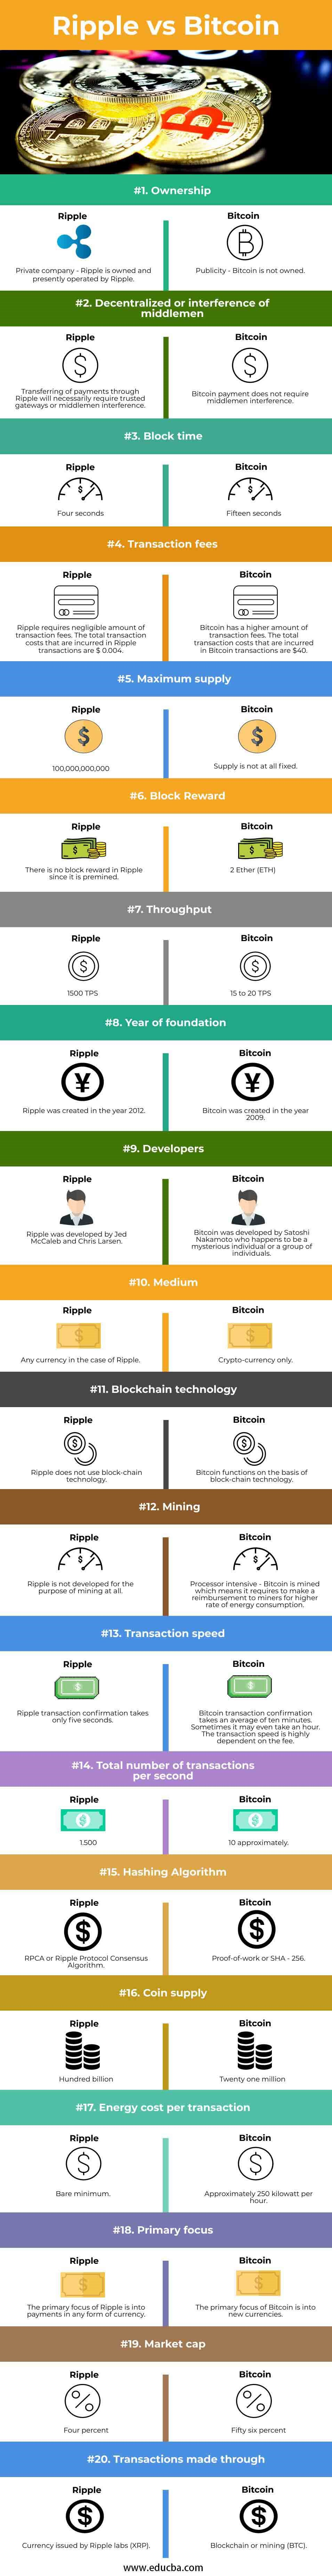 Ripple-vs-Bitcoin-info